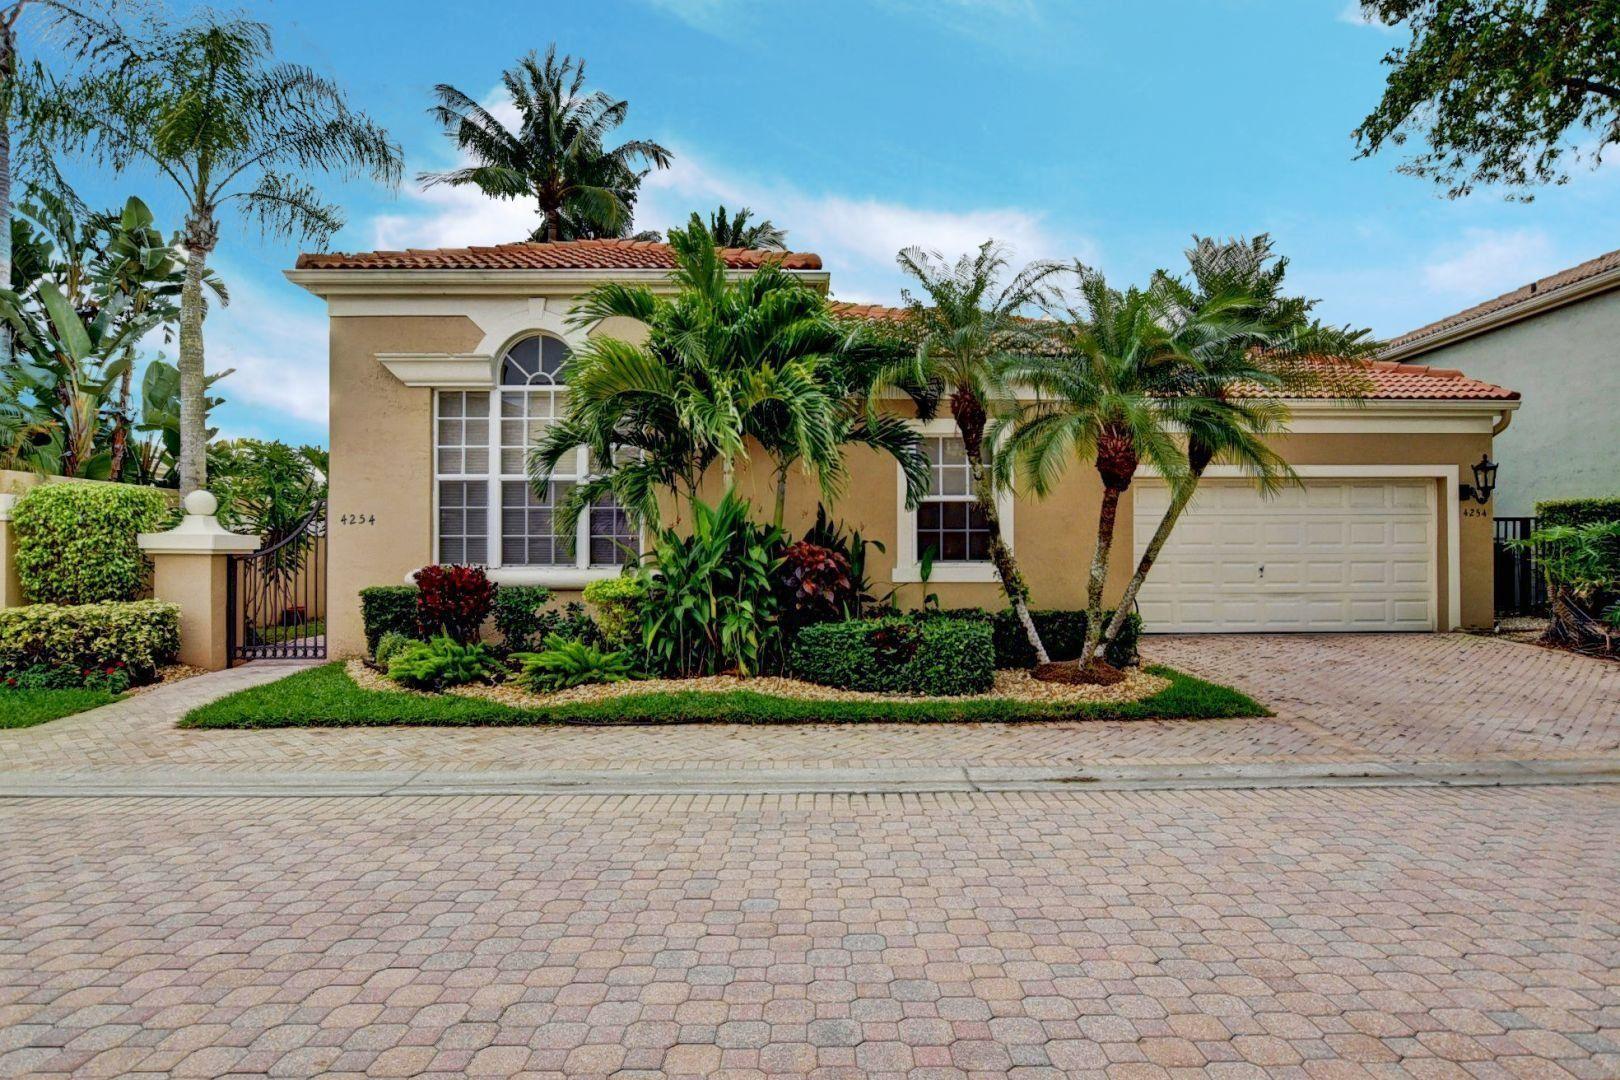 4254 NW 66th Place, Boca Raton, FL 33496 - MLS#: RX-10746609